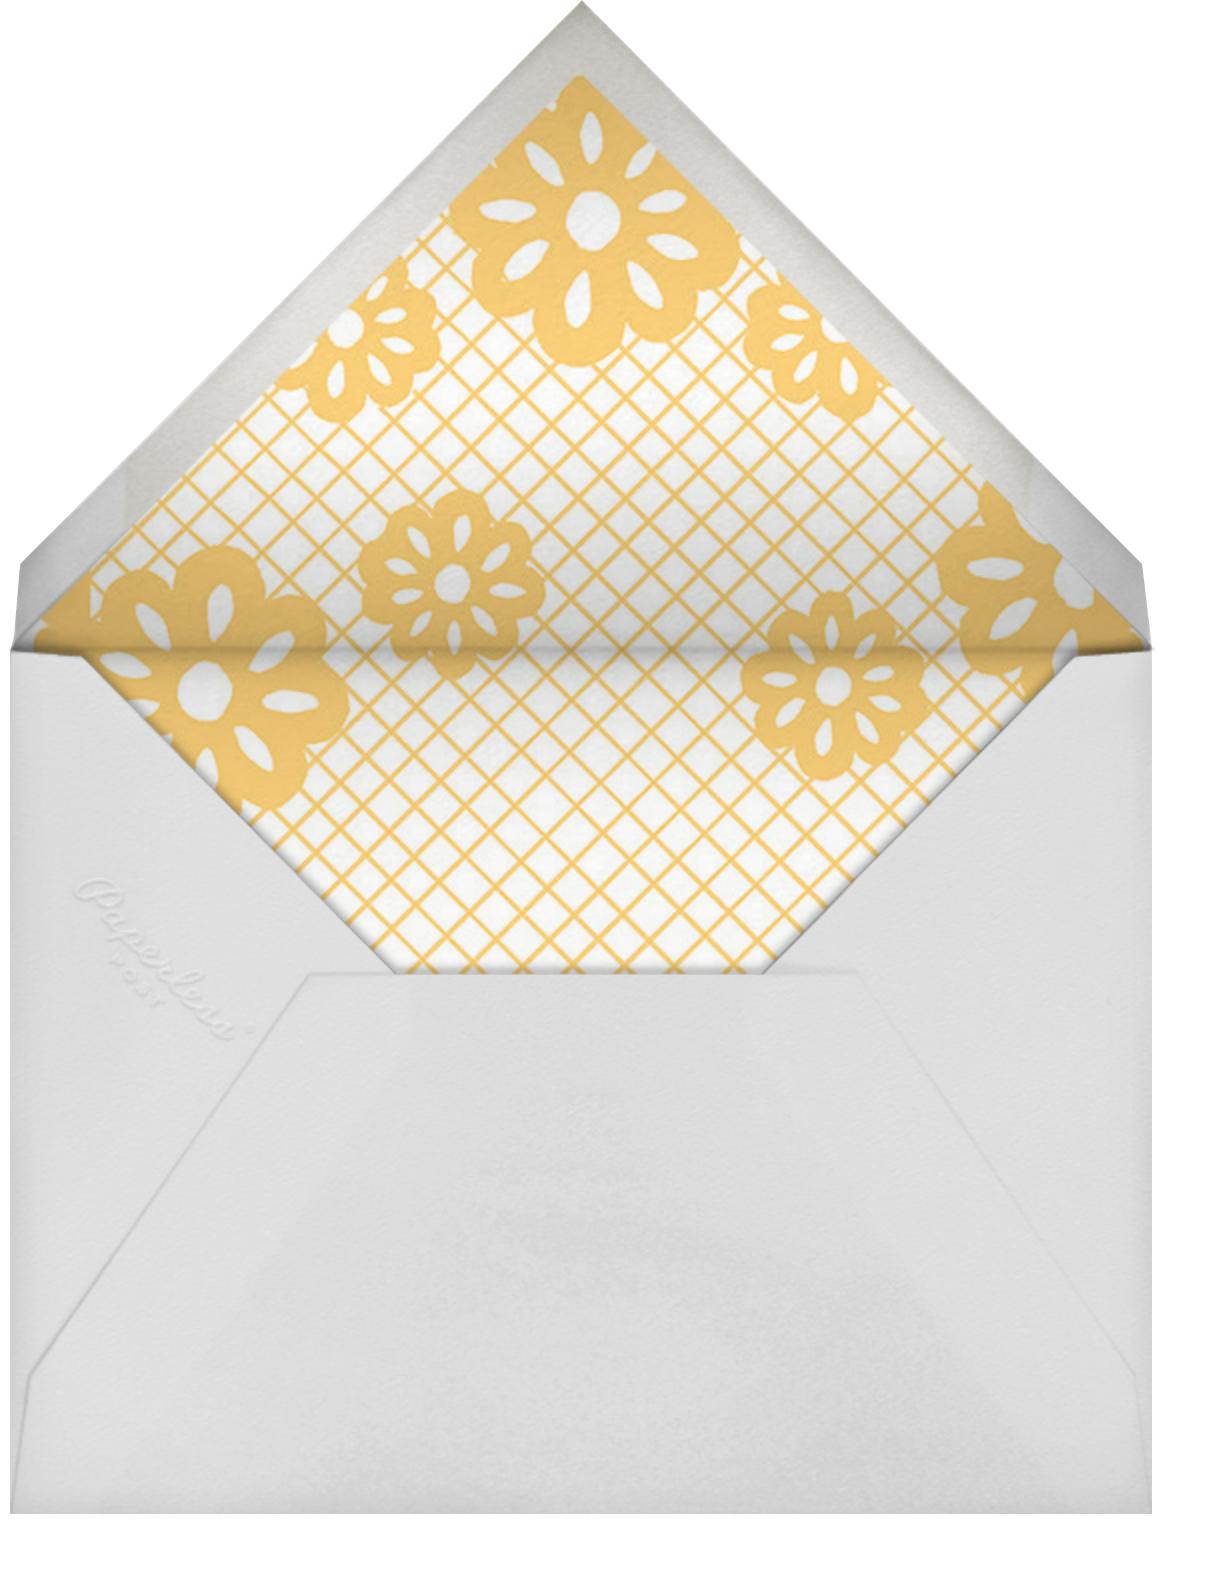 Papel Picado Celebration - Paperless Post - Cinco de Mayo - envelope back